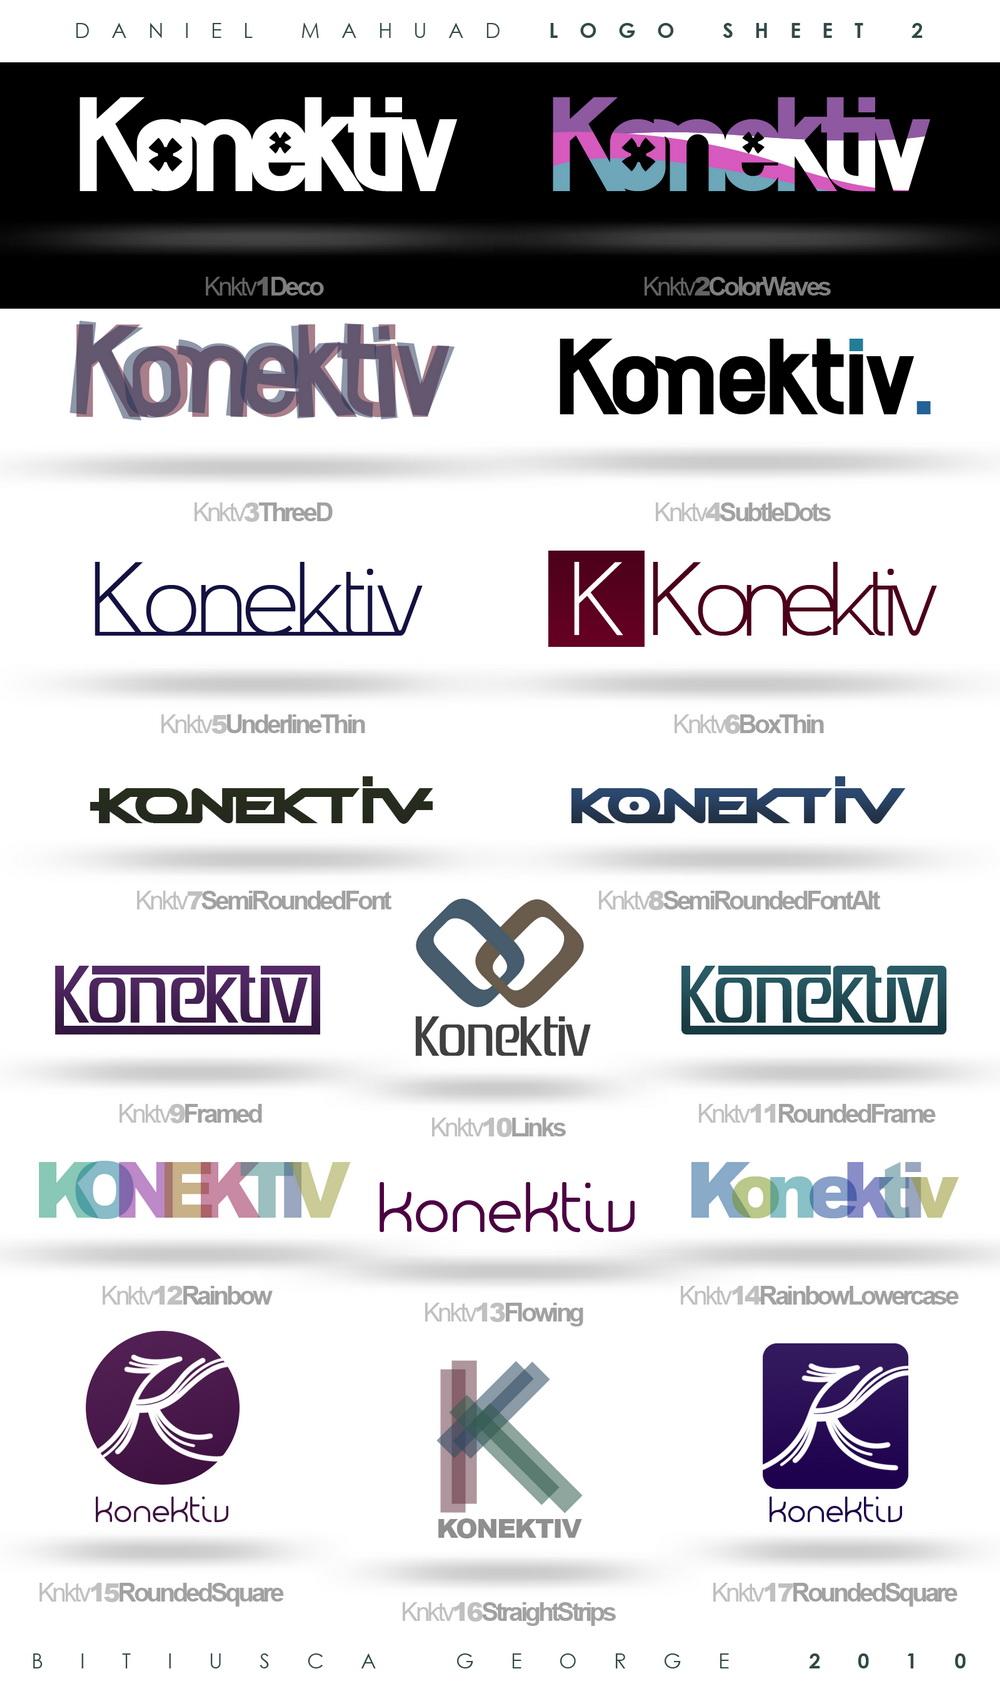 Konektiv - LogoSheet 2 by Horhew